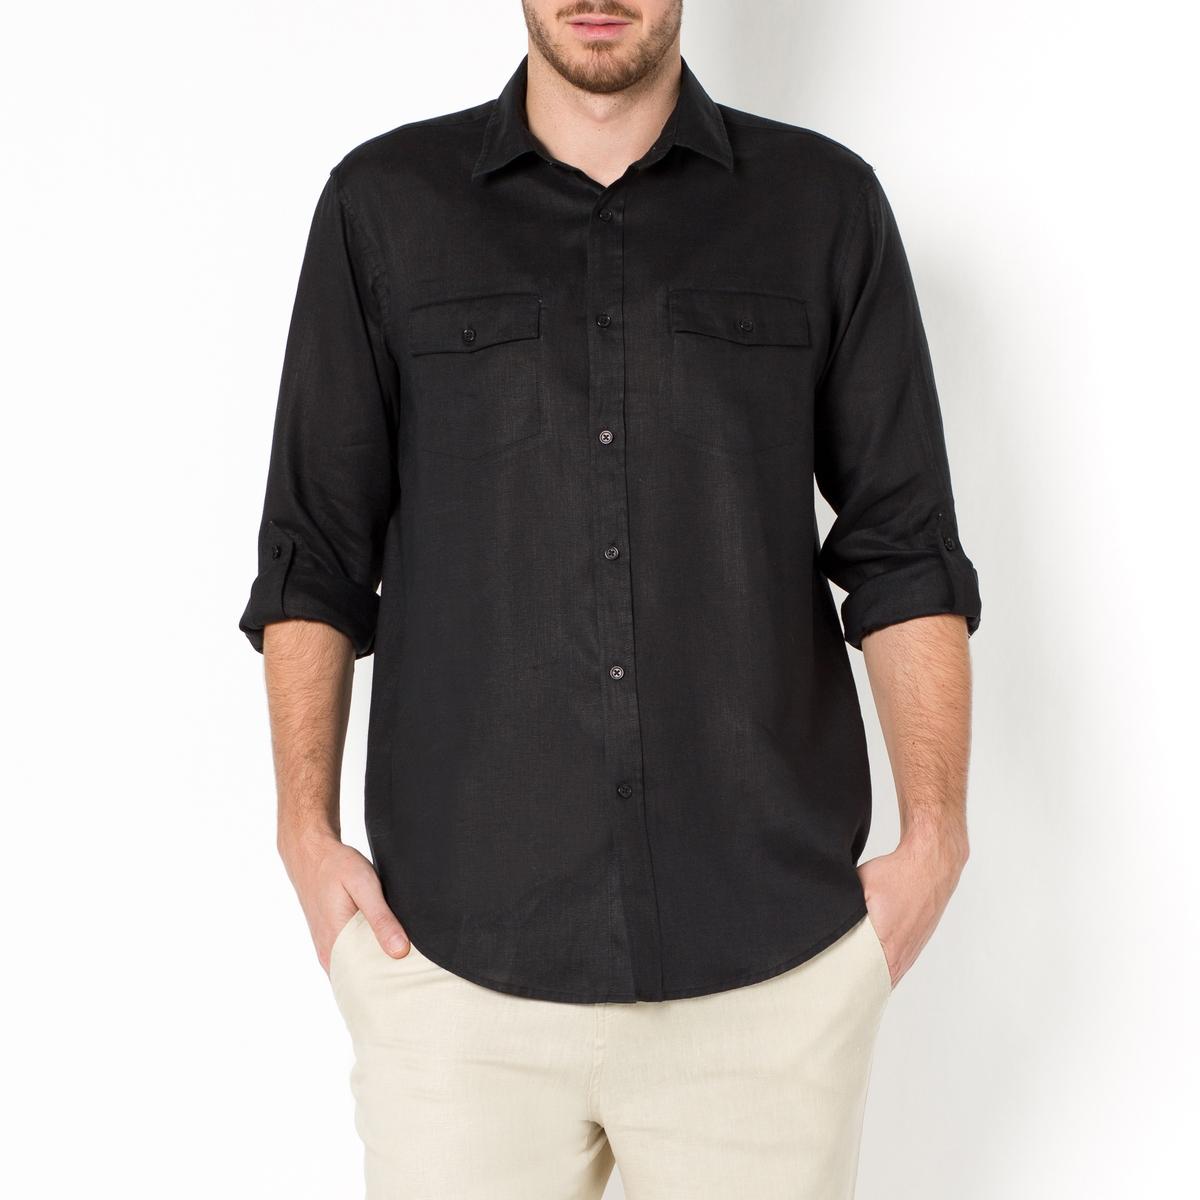 Camisa lisa, mangas compridas